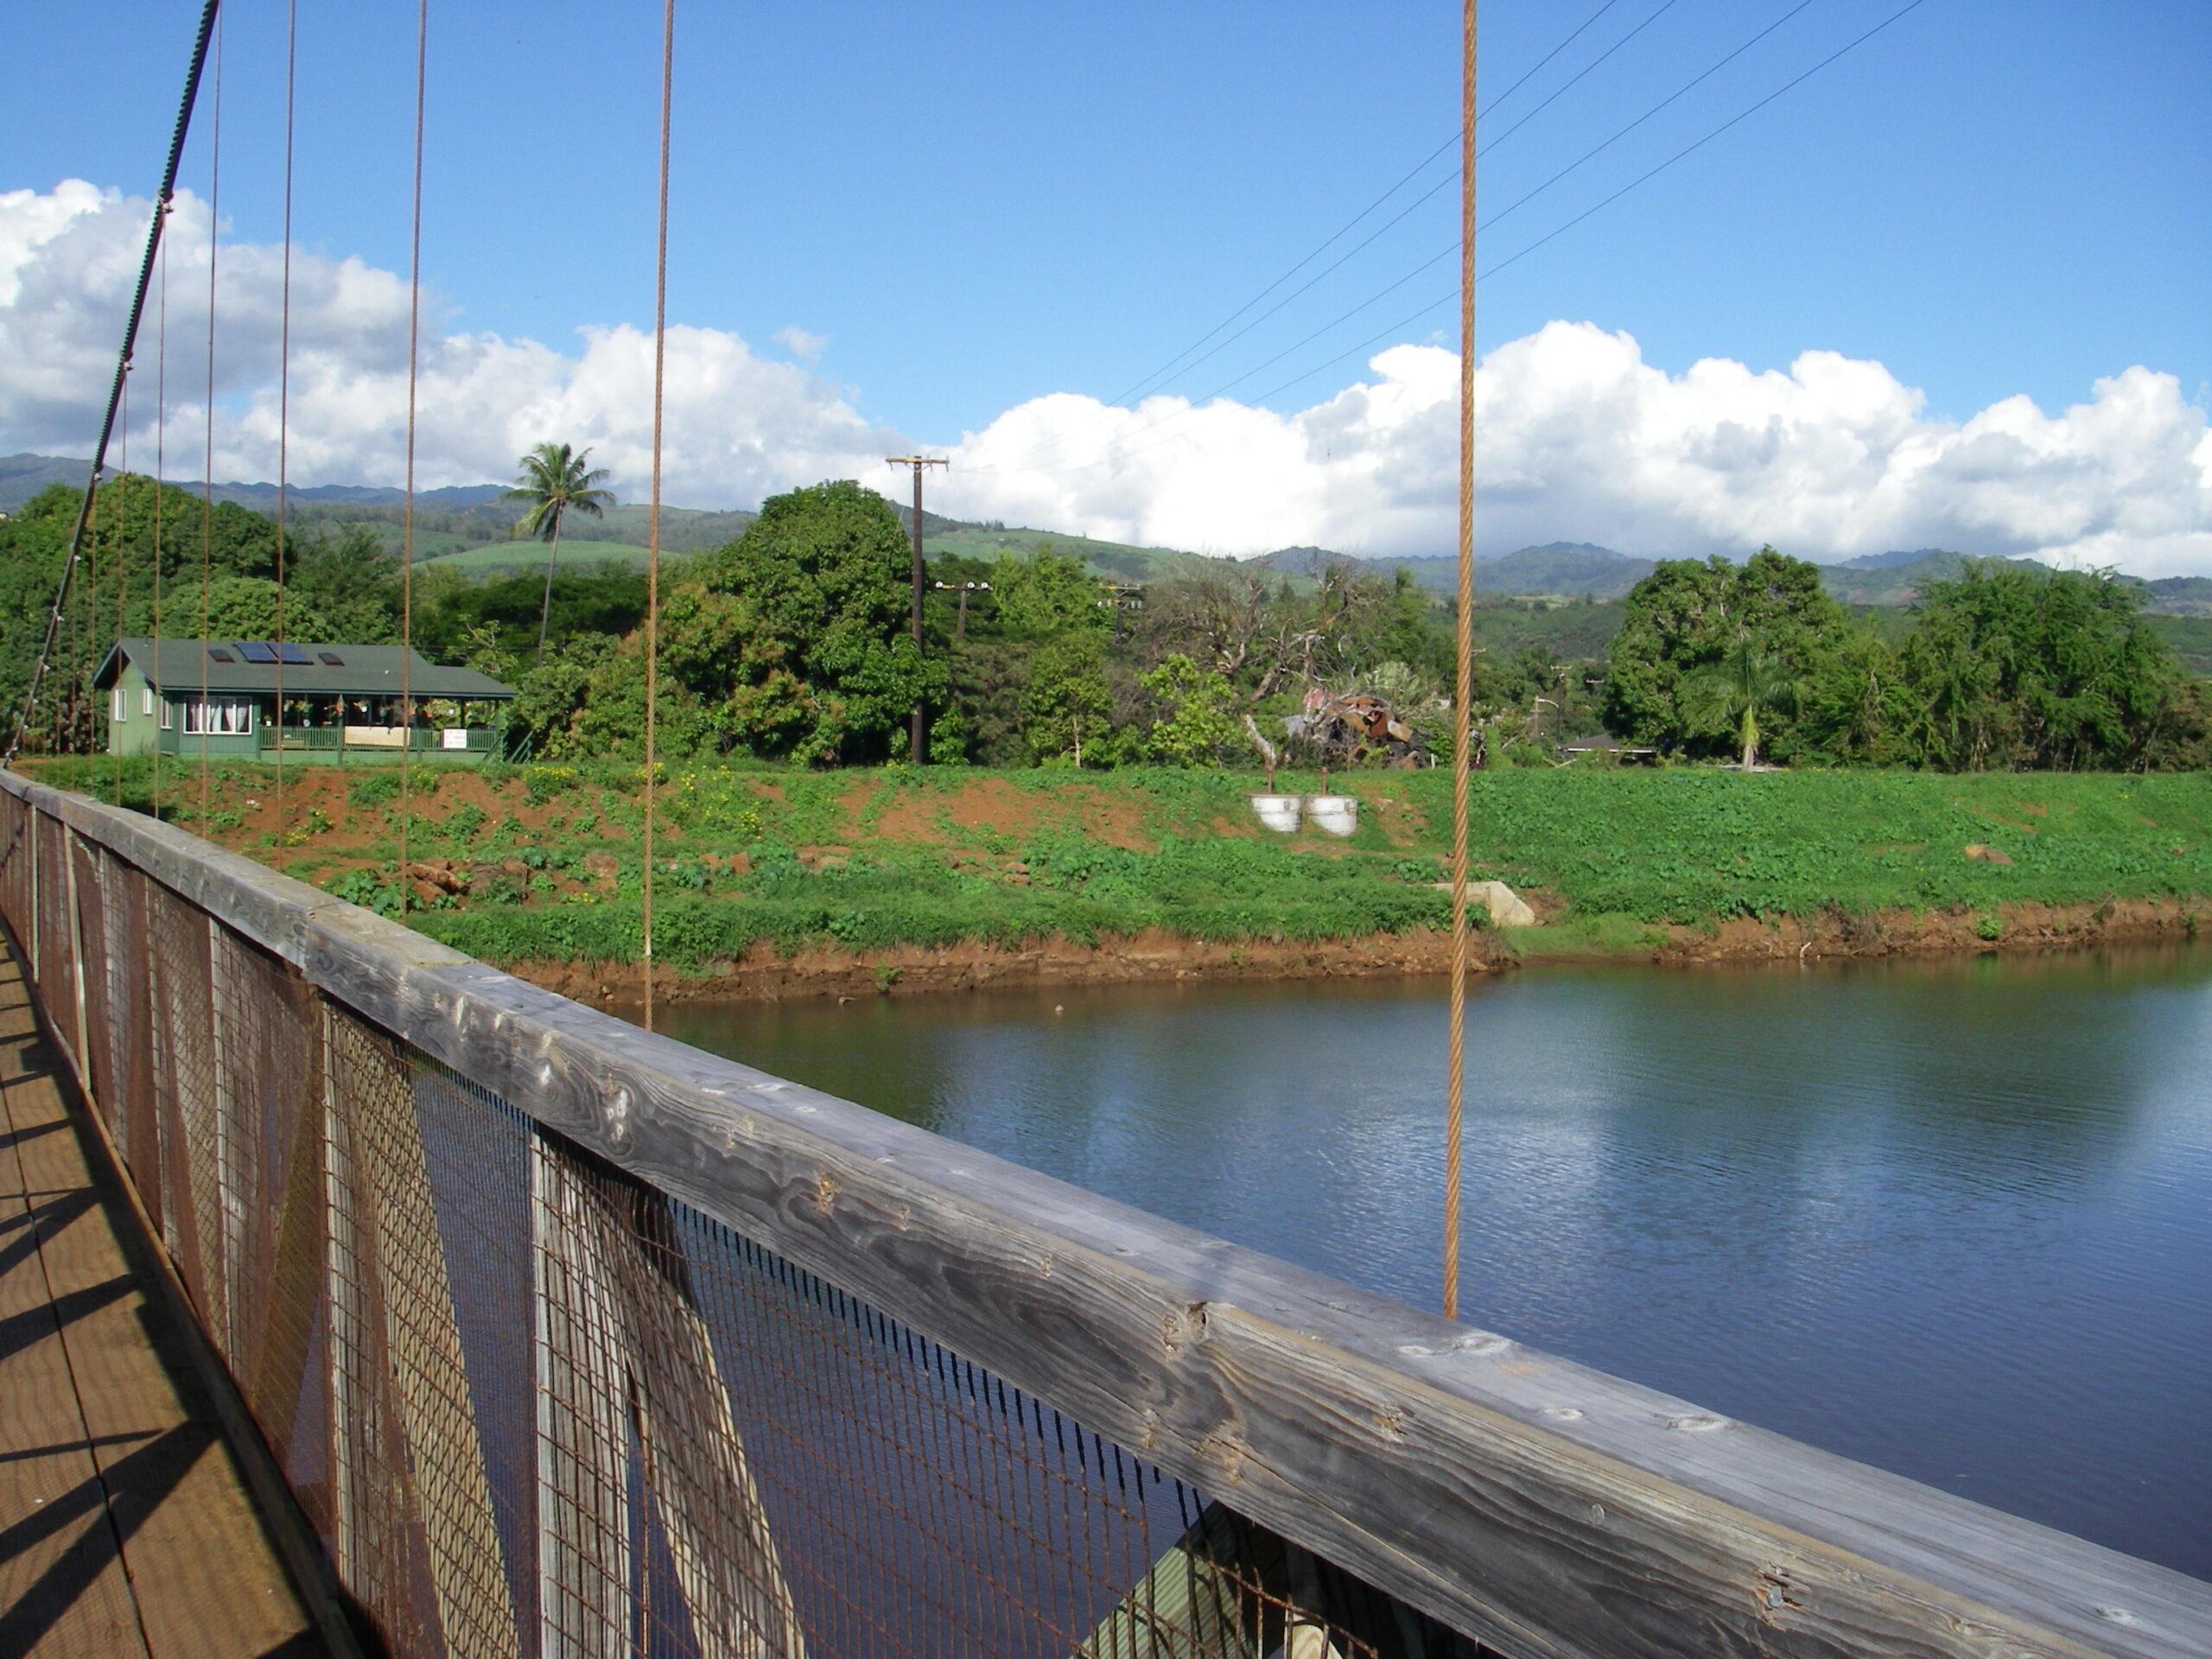 Swinging bridge in Hanapepe Kauai